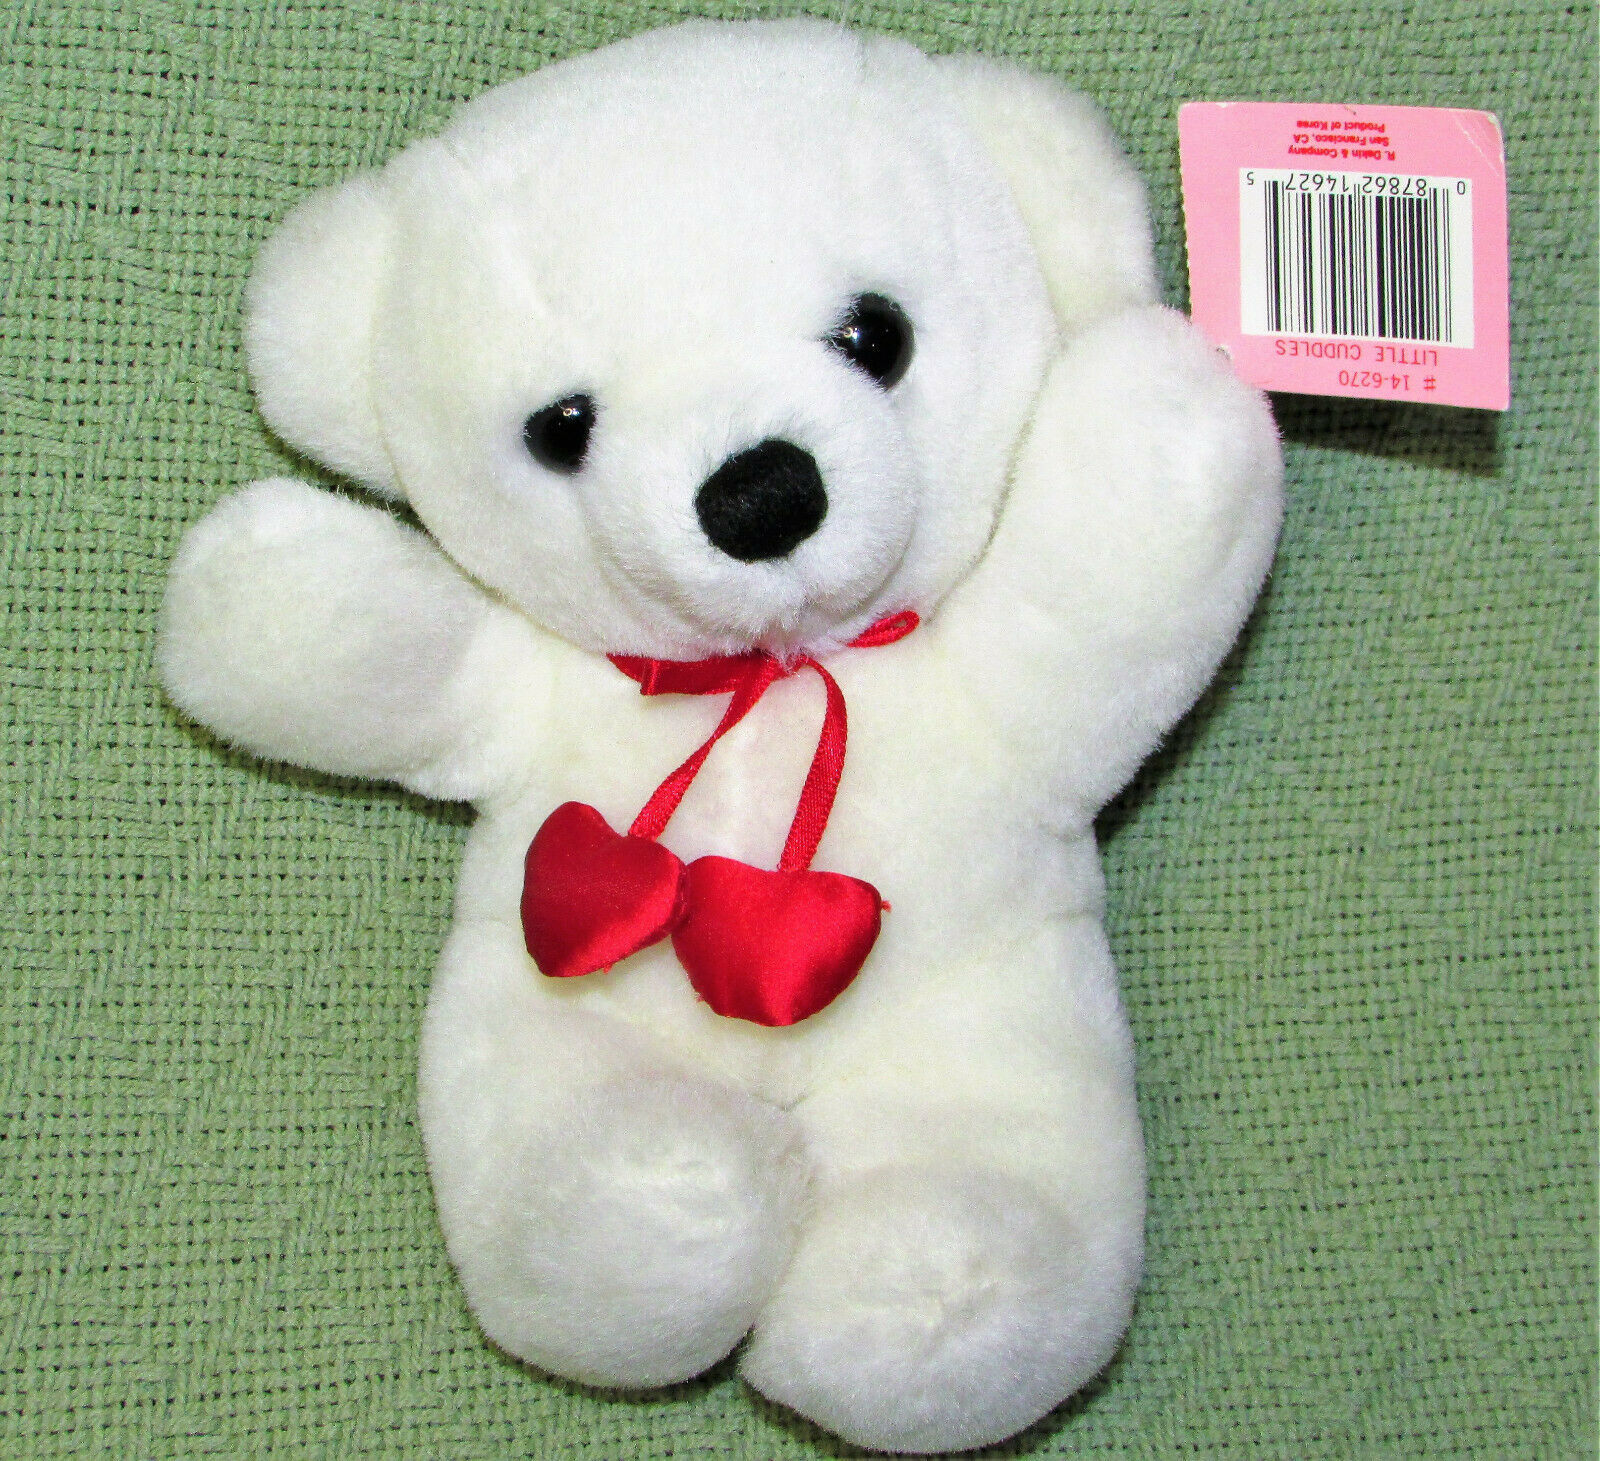 "VINTAGE DAKIN CUDDLES WHITE TEDDY BEAR 1979 7"" STUFFED ANIMAL TAG RED HEARTS BOW - $29.70"